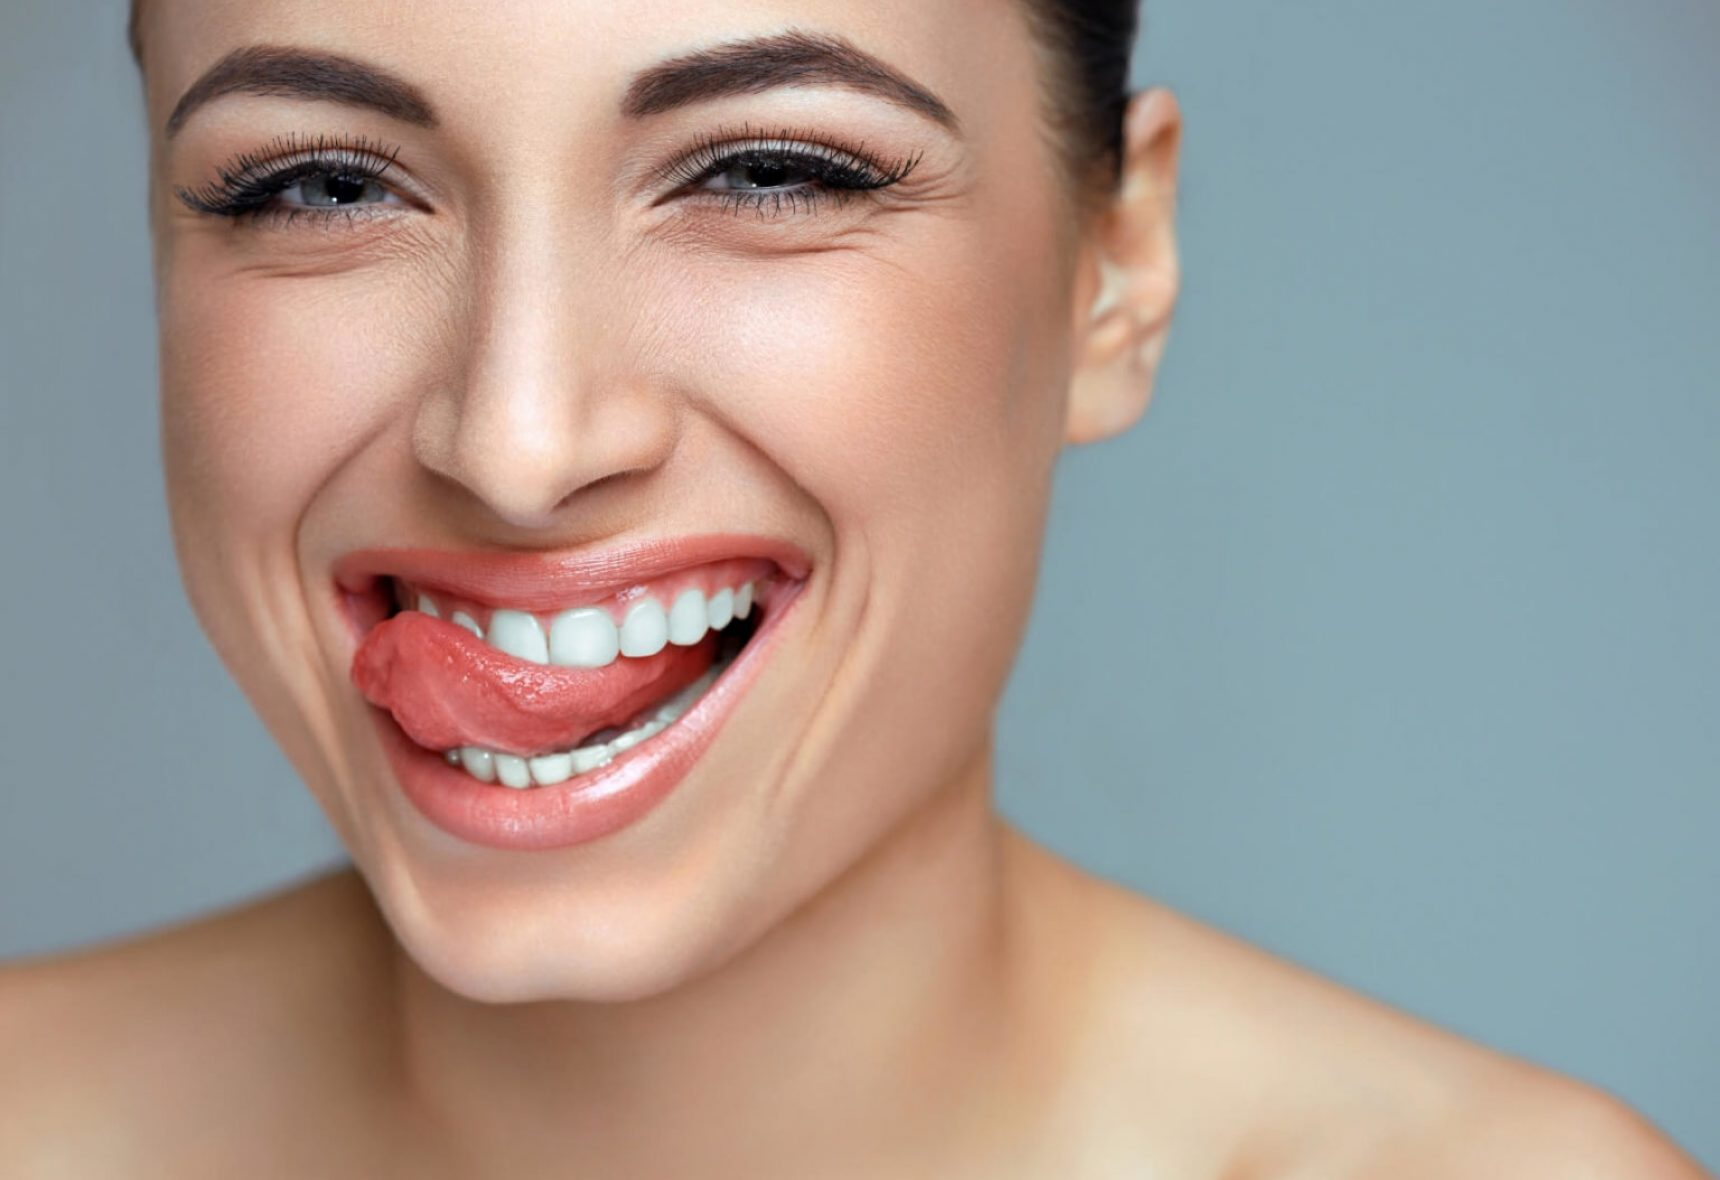 kit-per-sbiancamento-denti